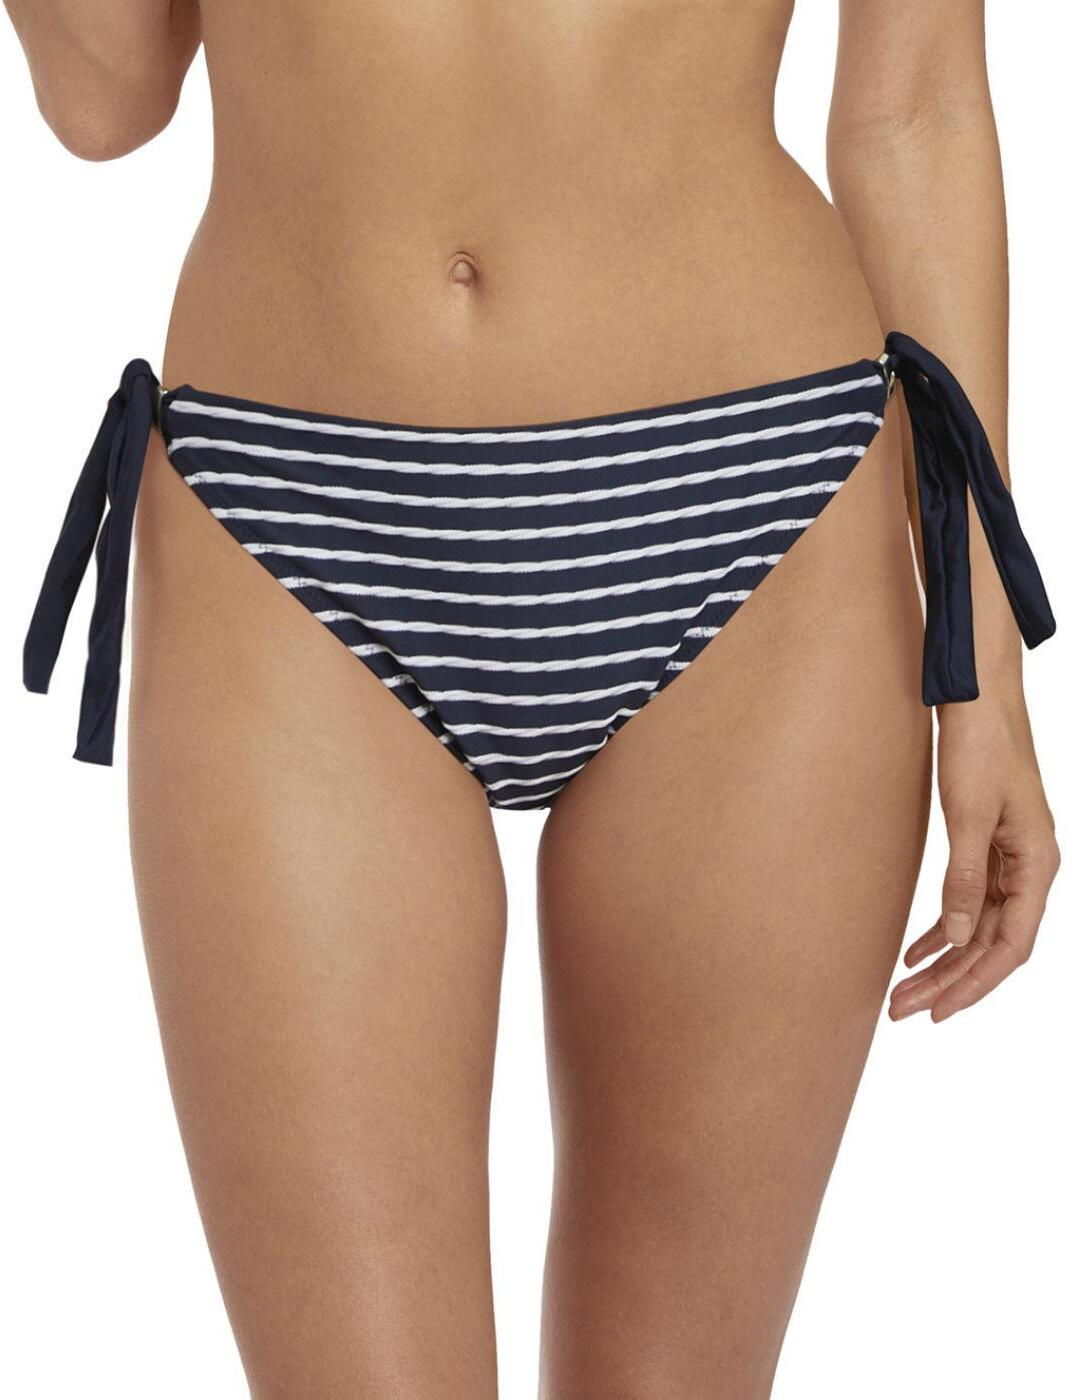 6505 Fantasie San Remo Classic Tie Side Bikini Brief - 6505 Ink